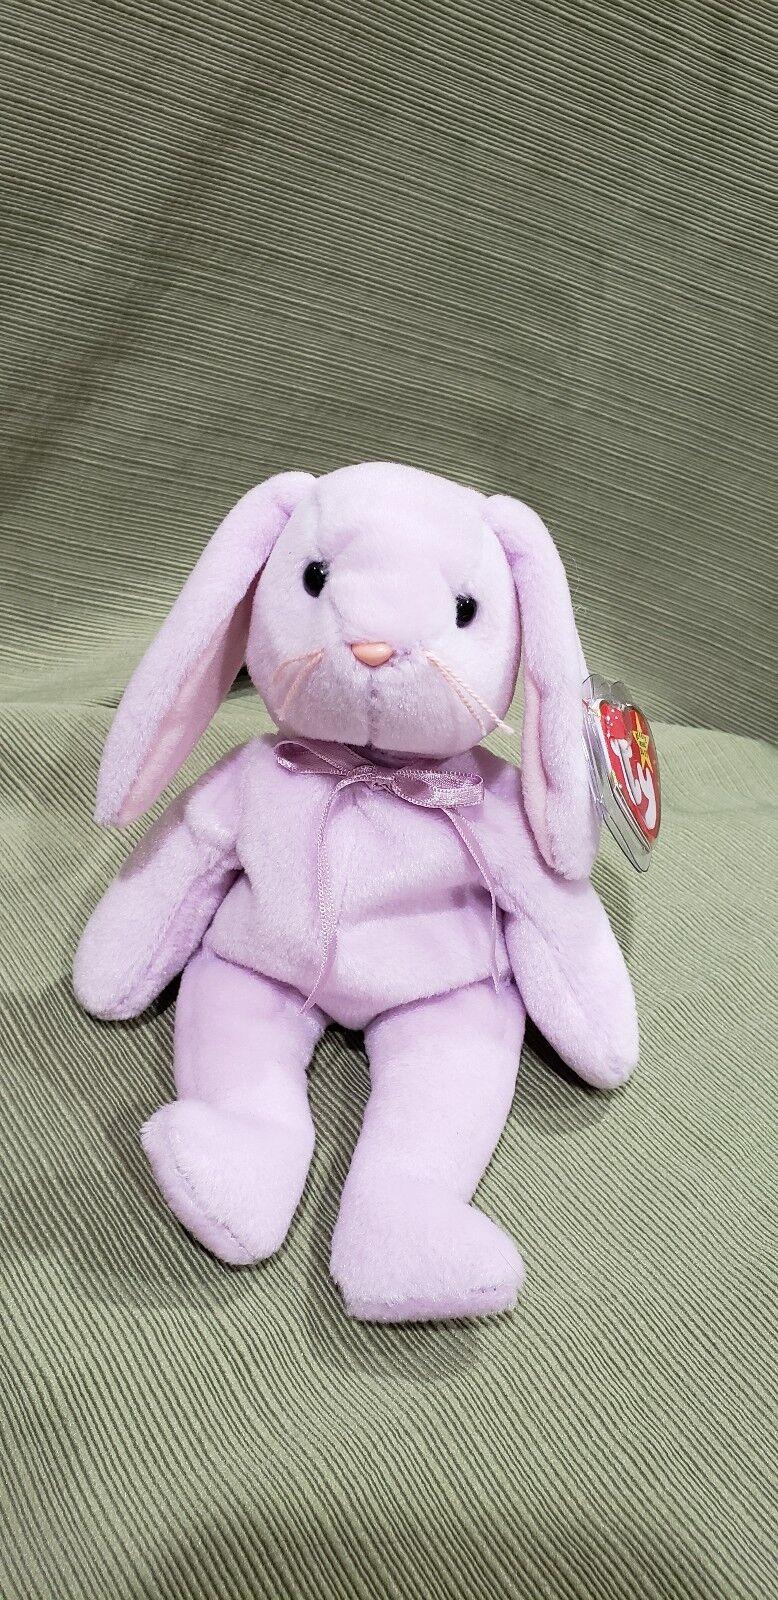 Ty Beanie Baby Floppity the Lavender Bunny w Errors 1996 MWMT